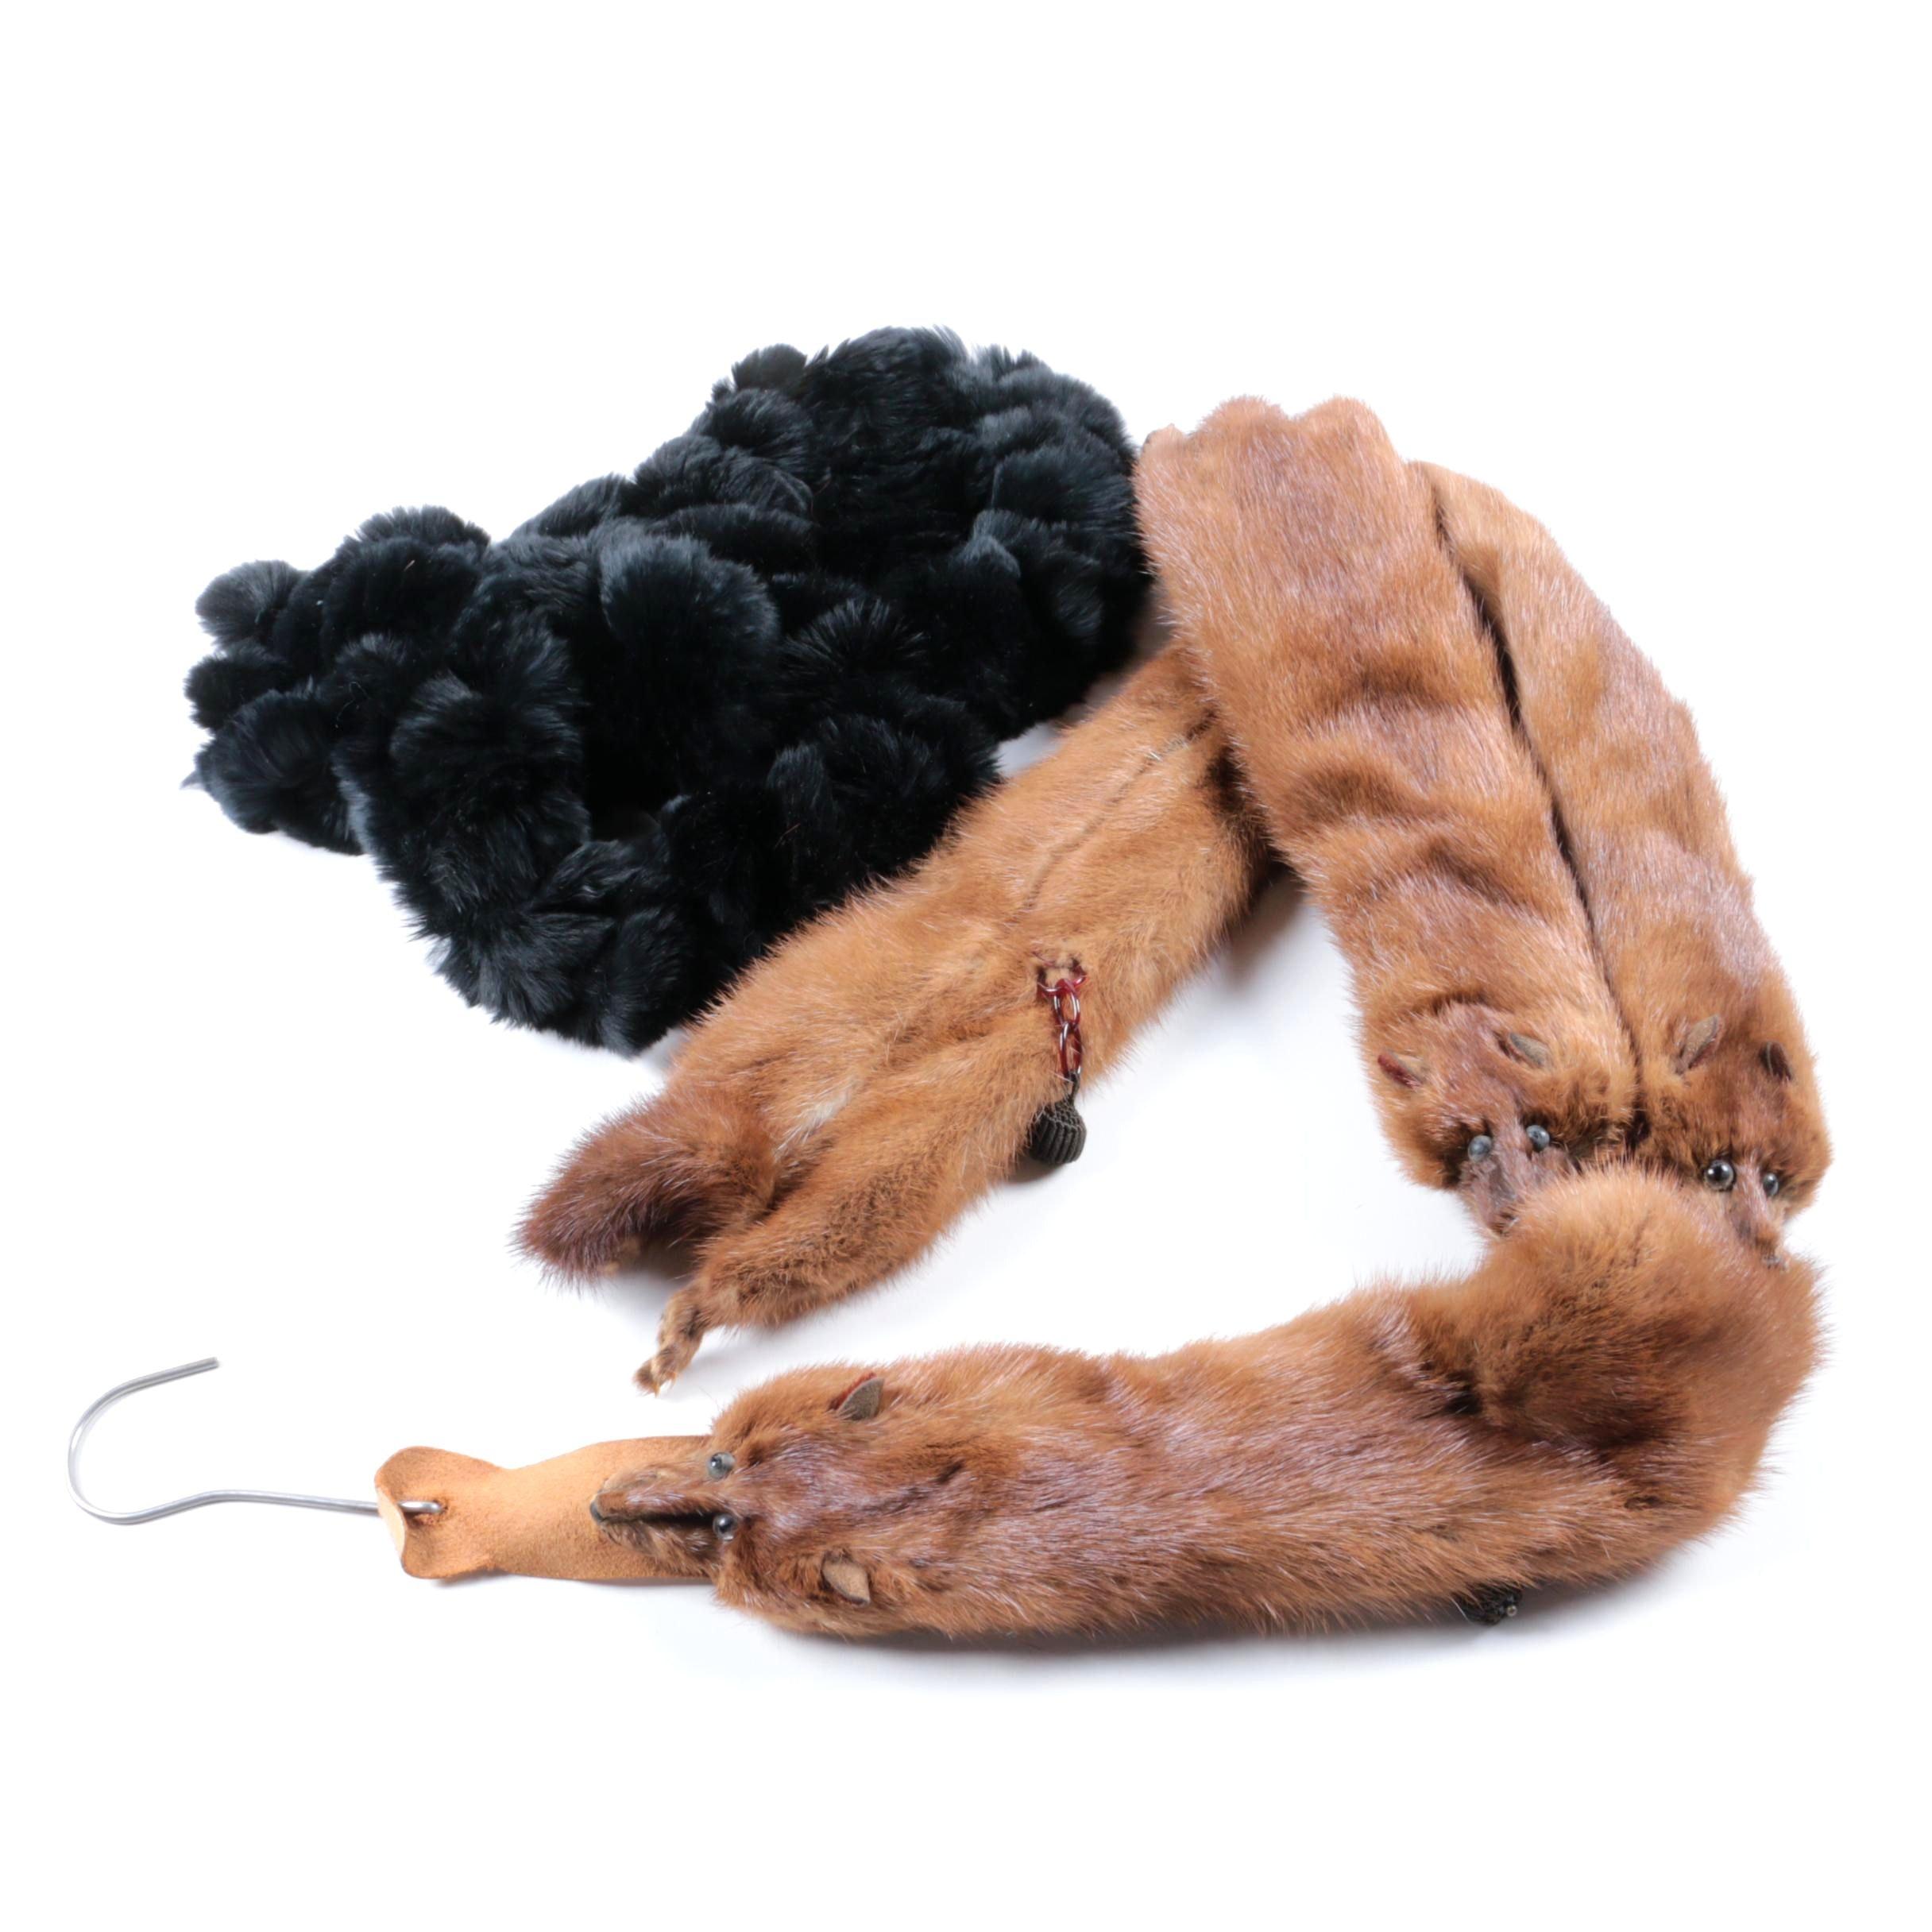 Vintage Mink Wrap and Black Rabbit Fur Pom Pom Scarf